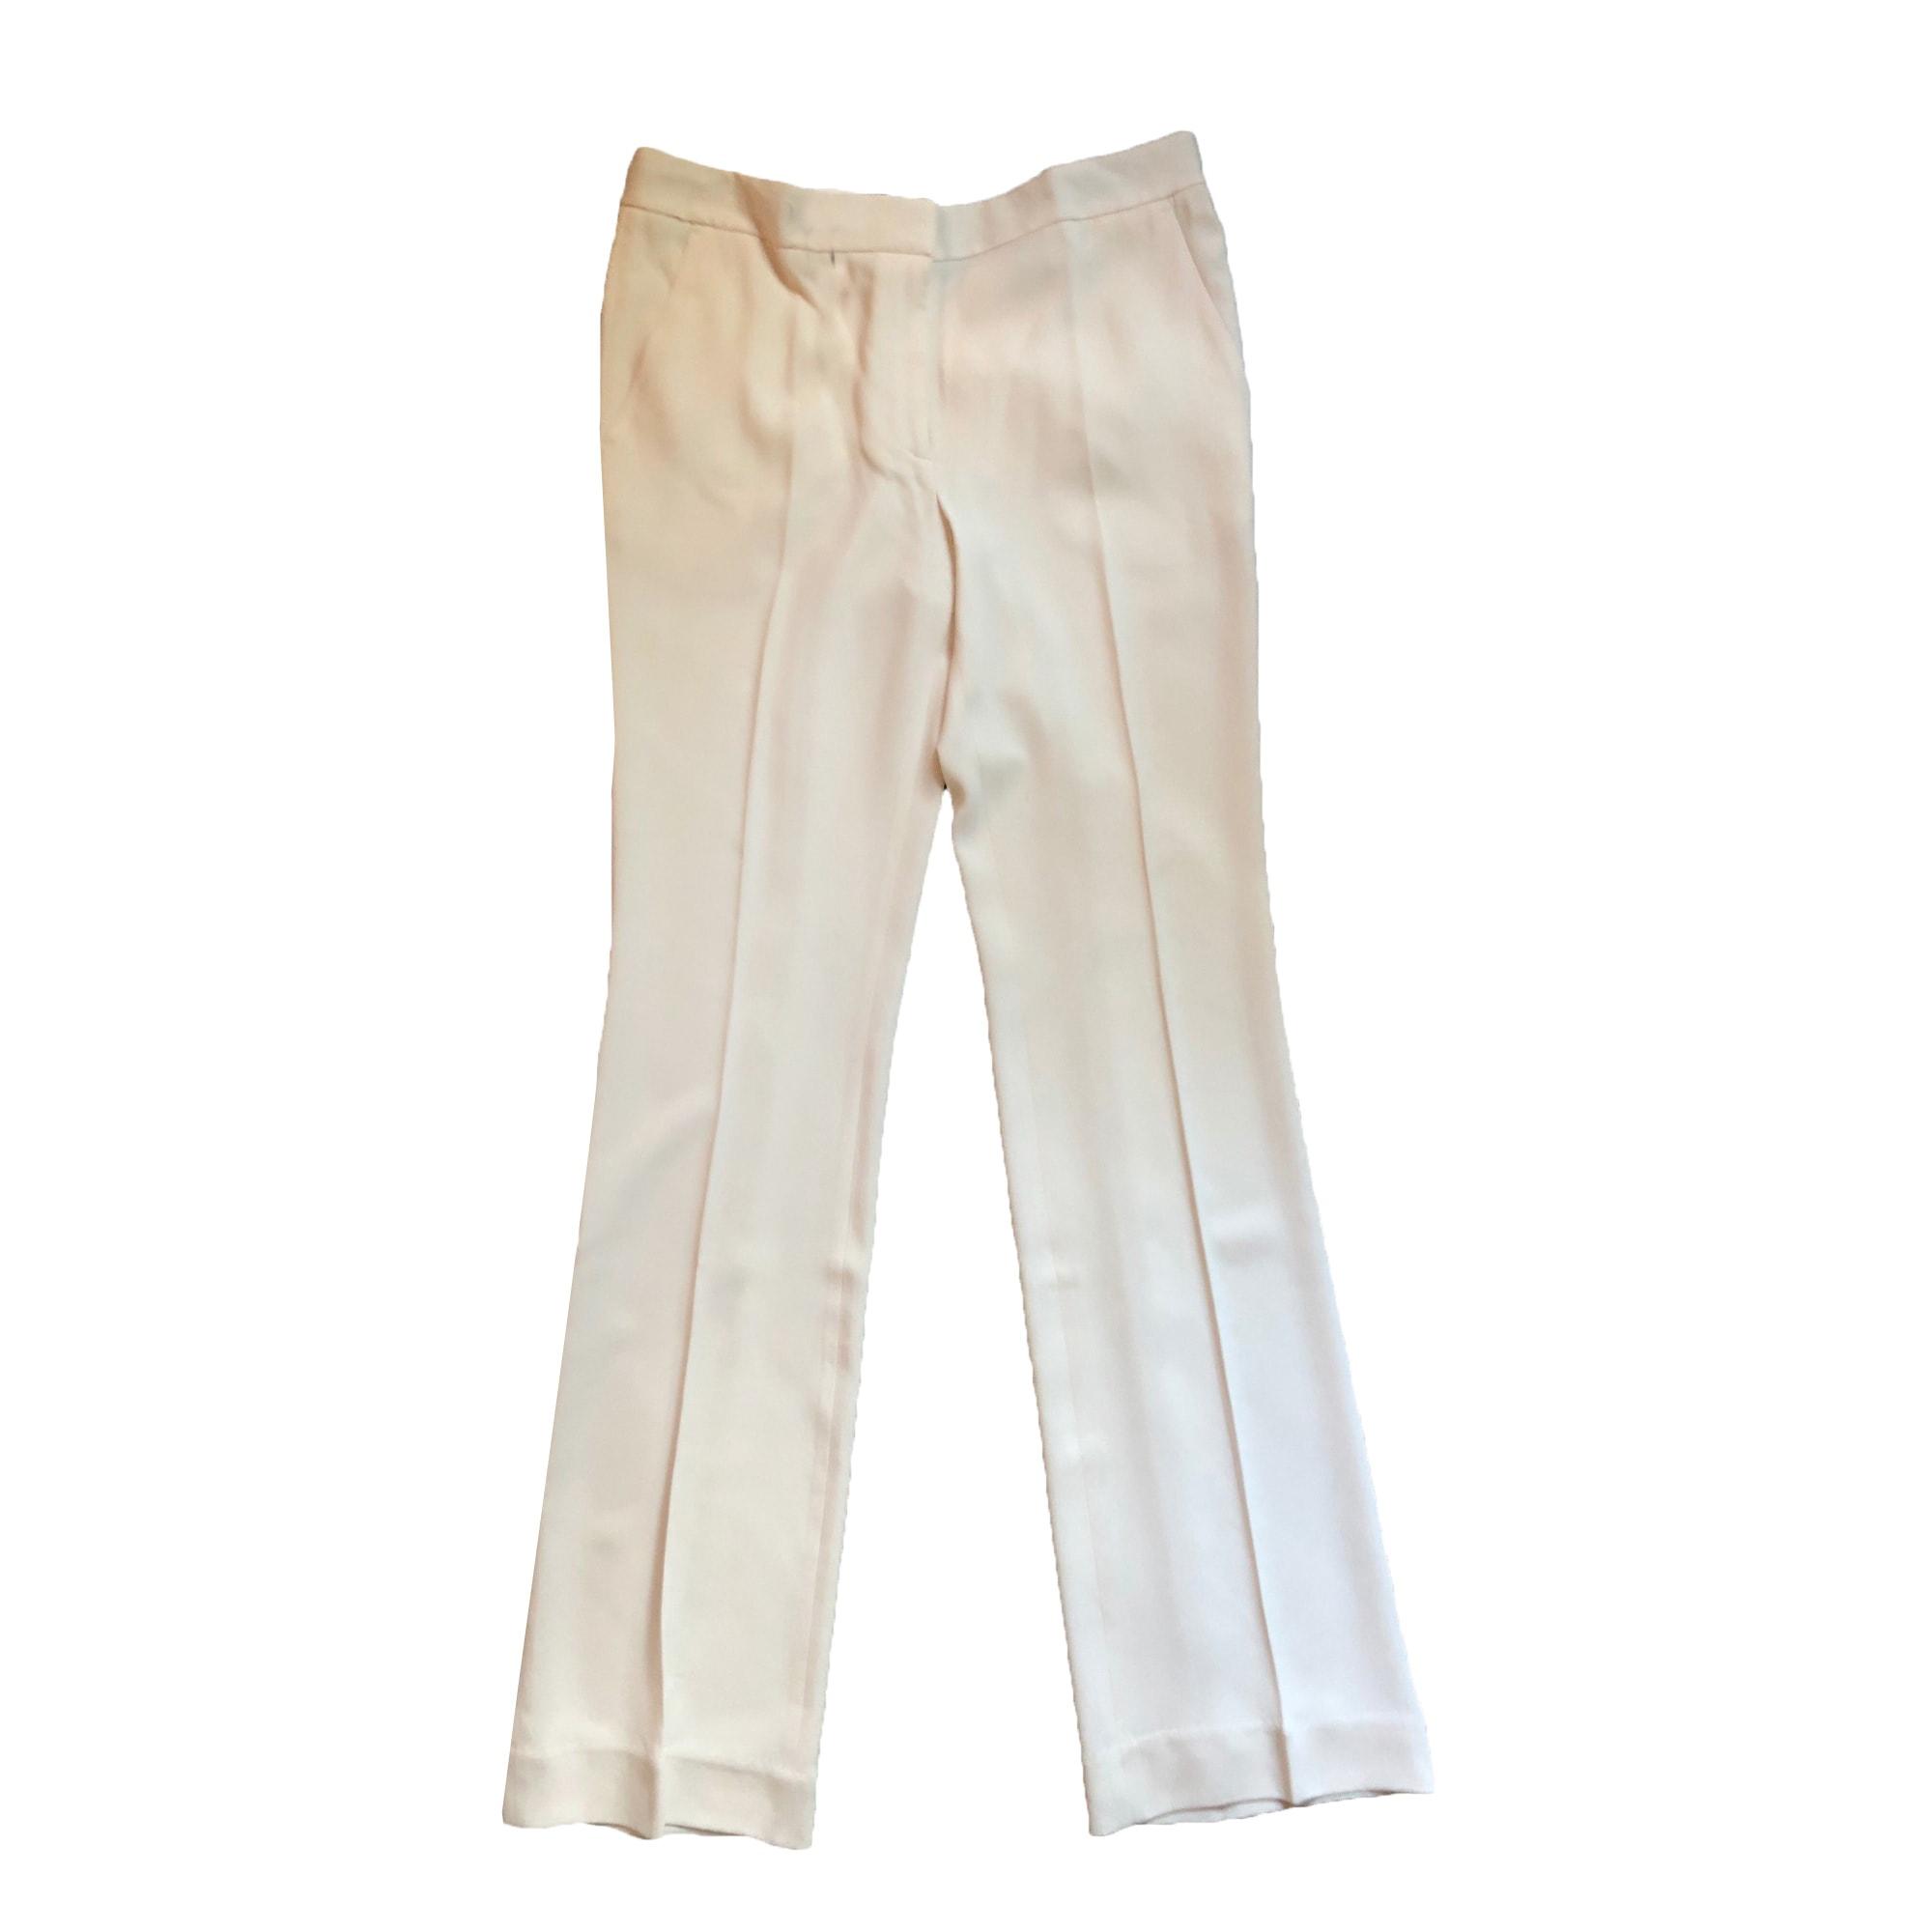 Pantalon droit BY MALENE BIRGER Blanc, blanc cassé, écru